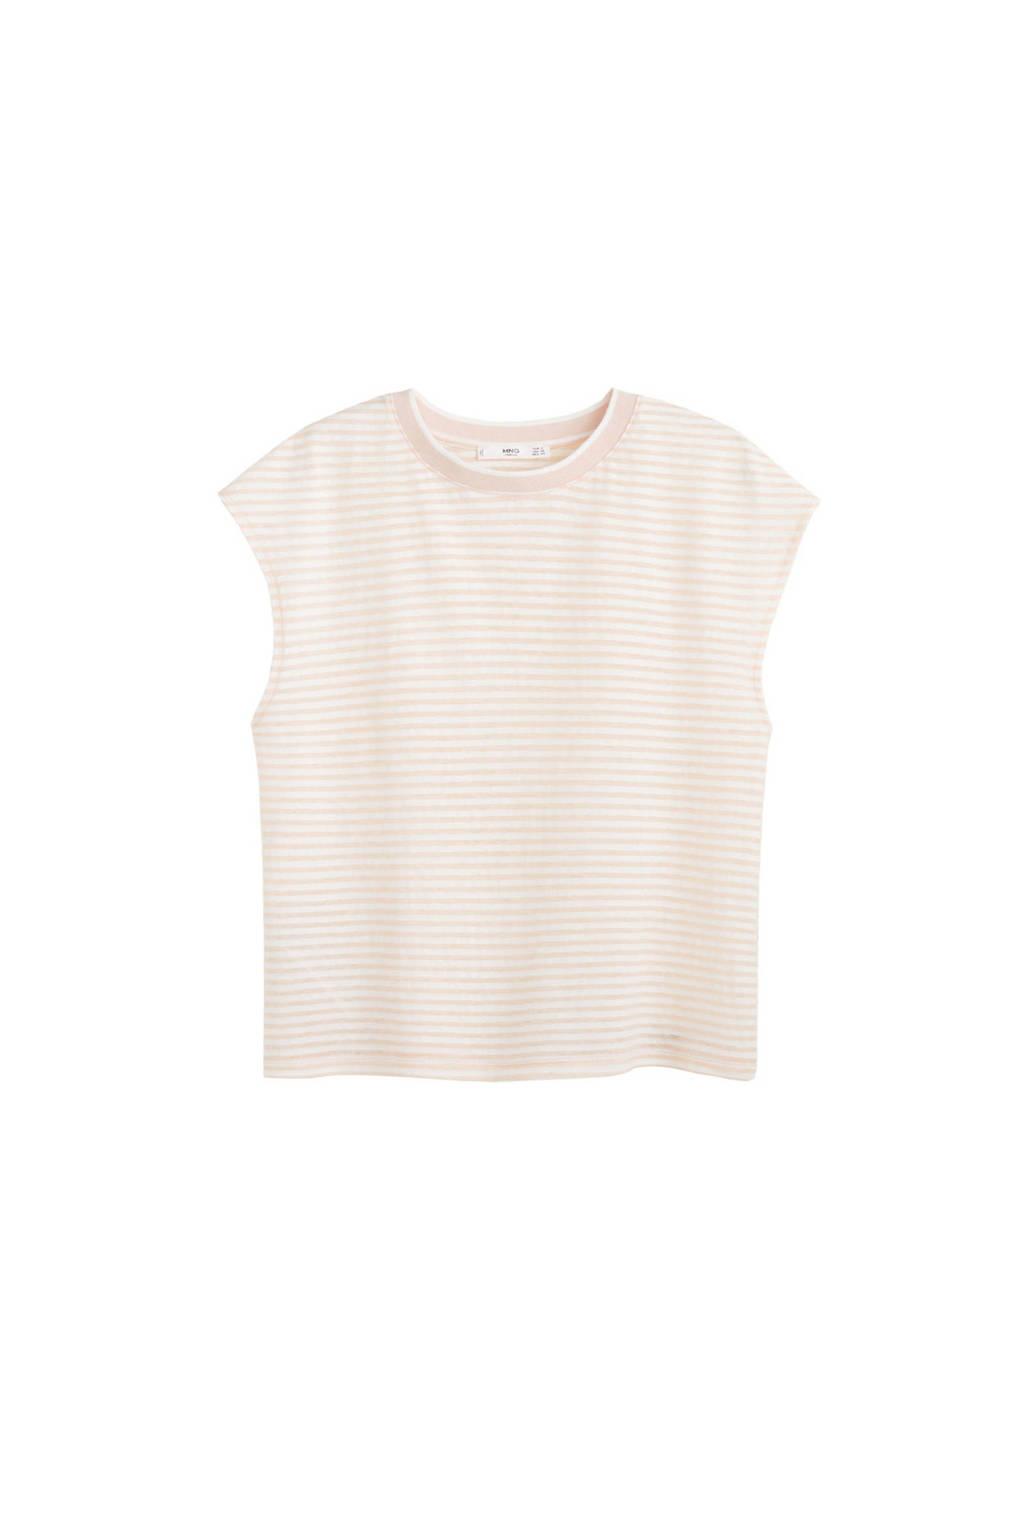 Mango T-shirt met strepen wit, Wit/roze